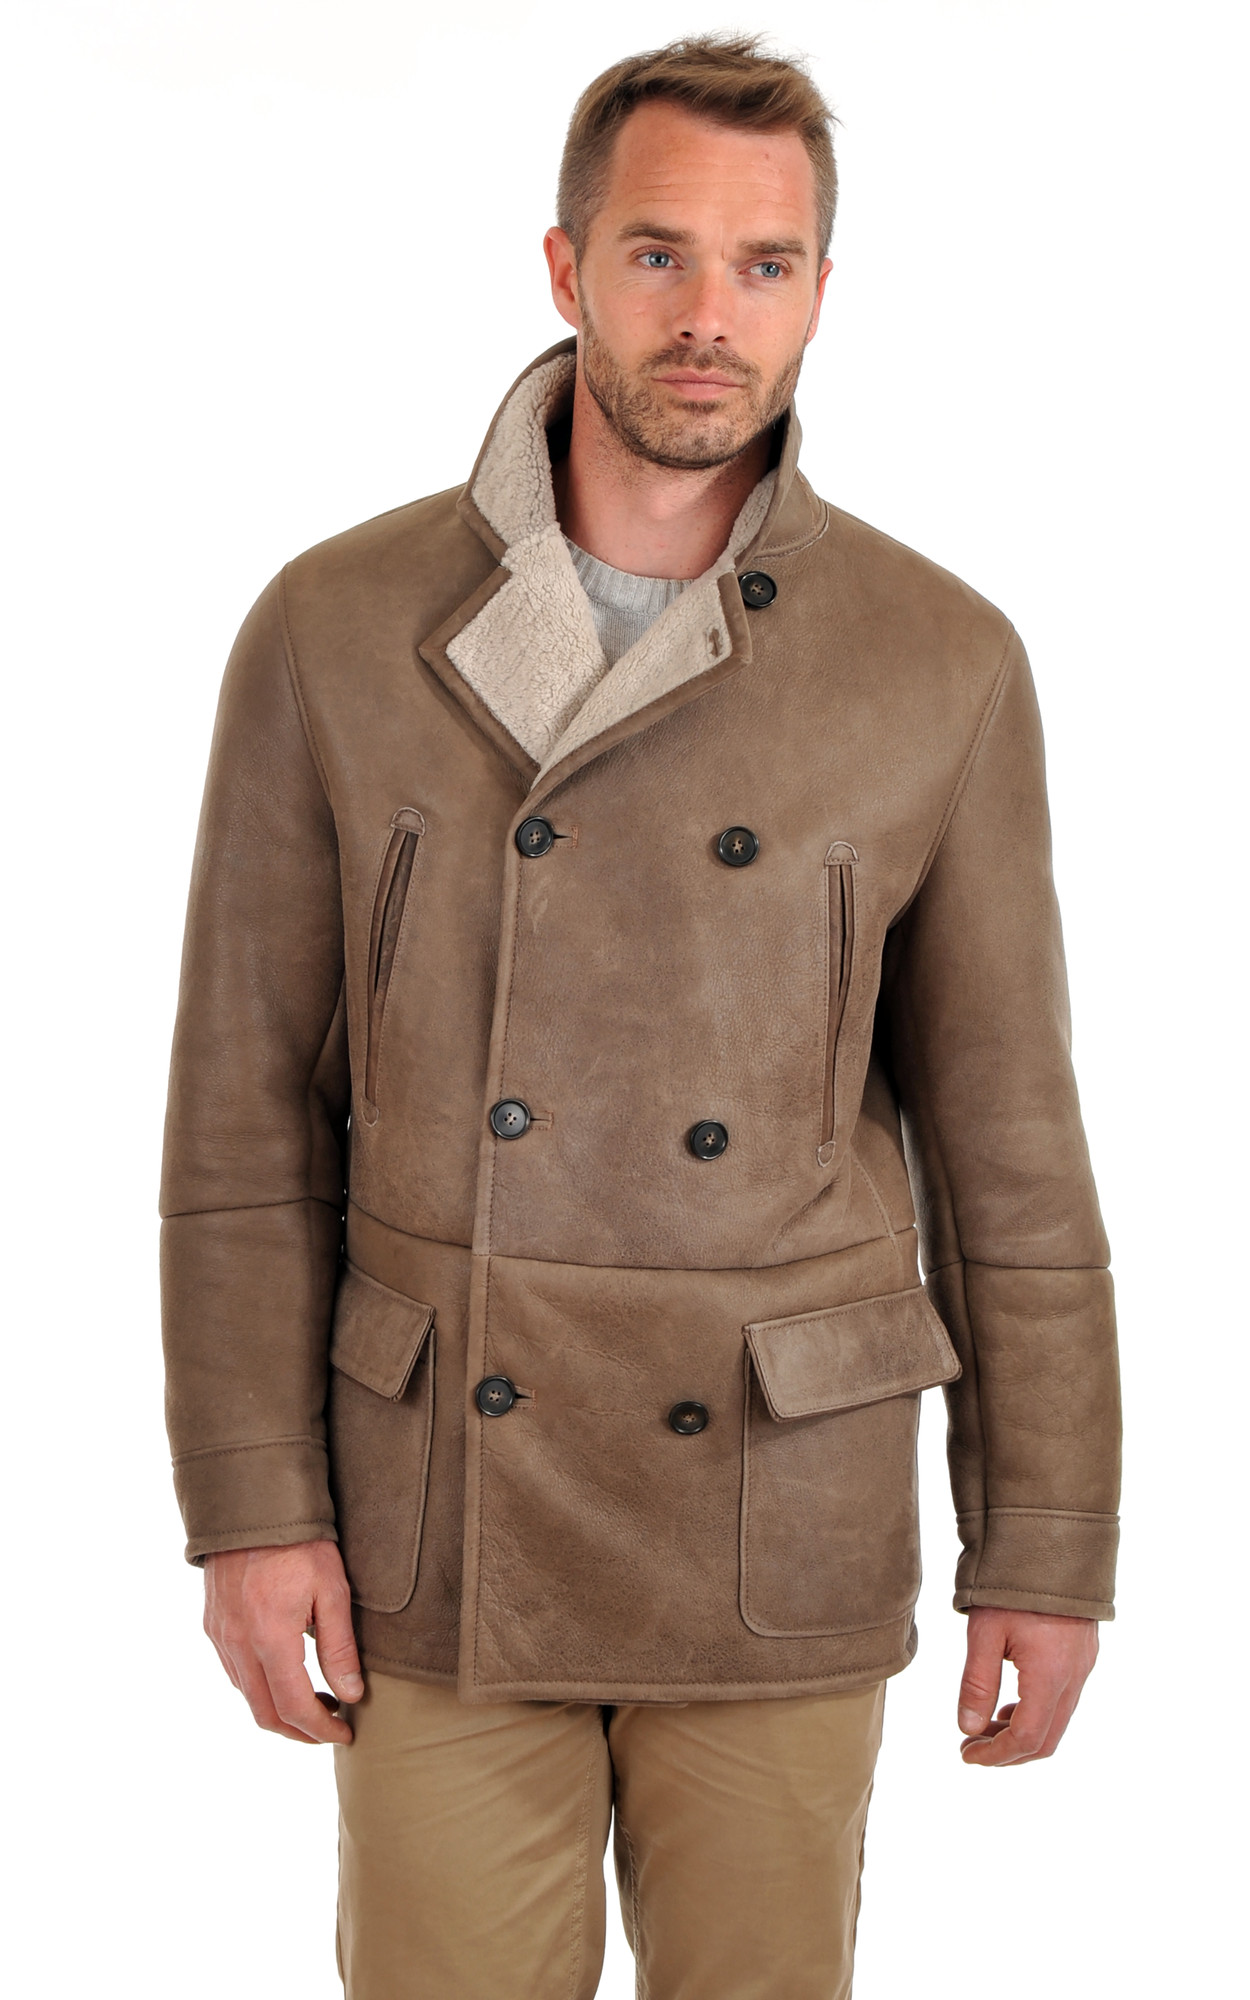 Manteau en peau retournee homme